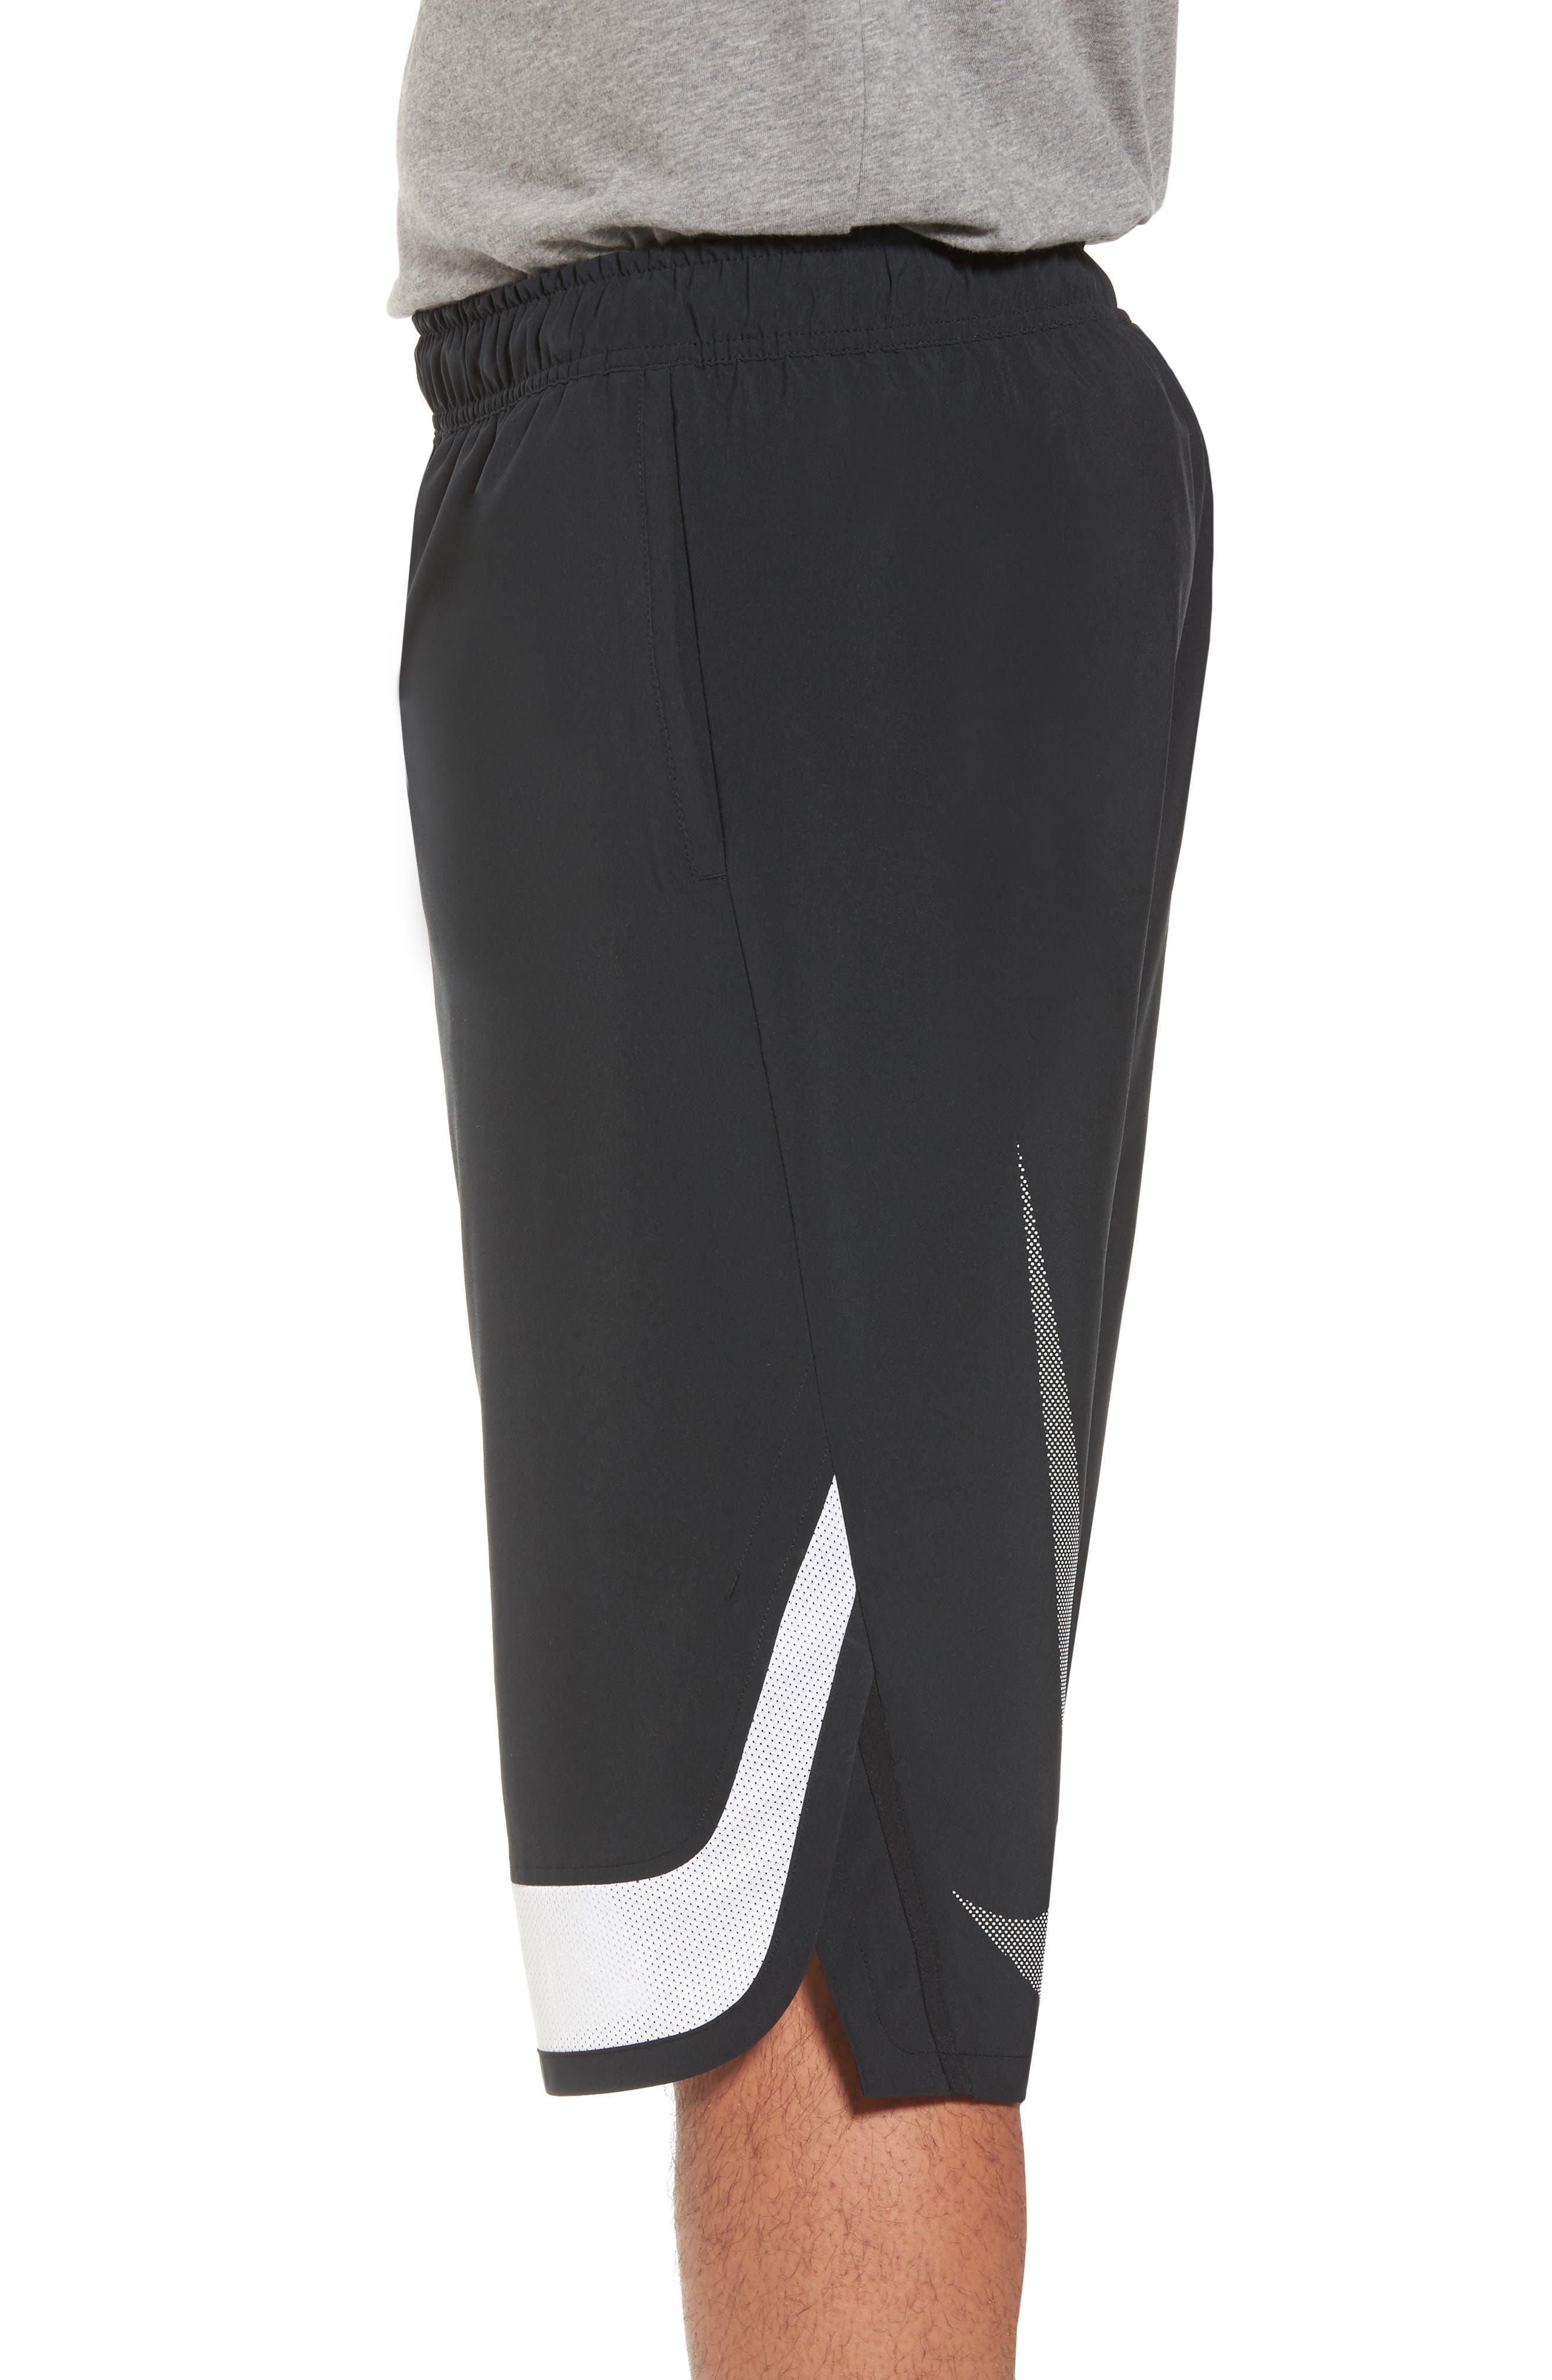 Training Flex PX Shorts,                             Alternate thumbnail 3, color,                             BLACK/ WHITE/ WHITE